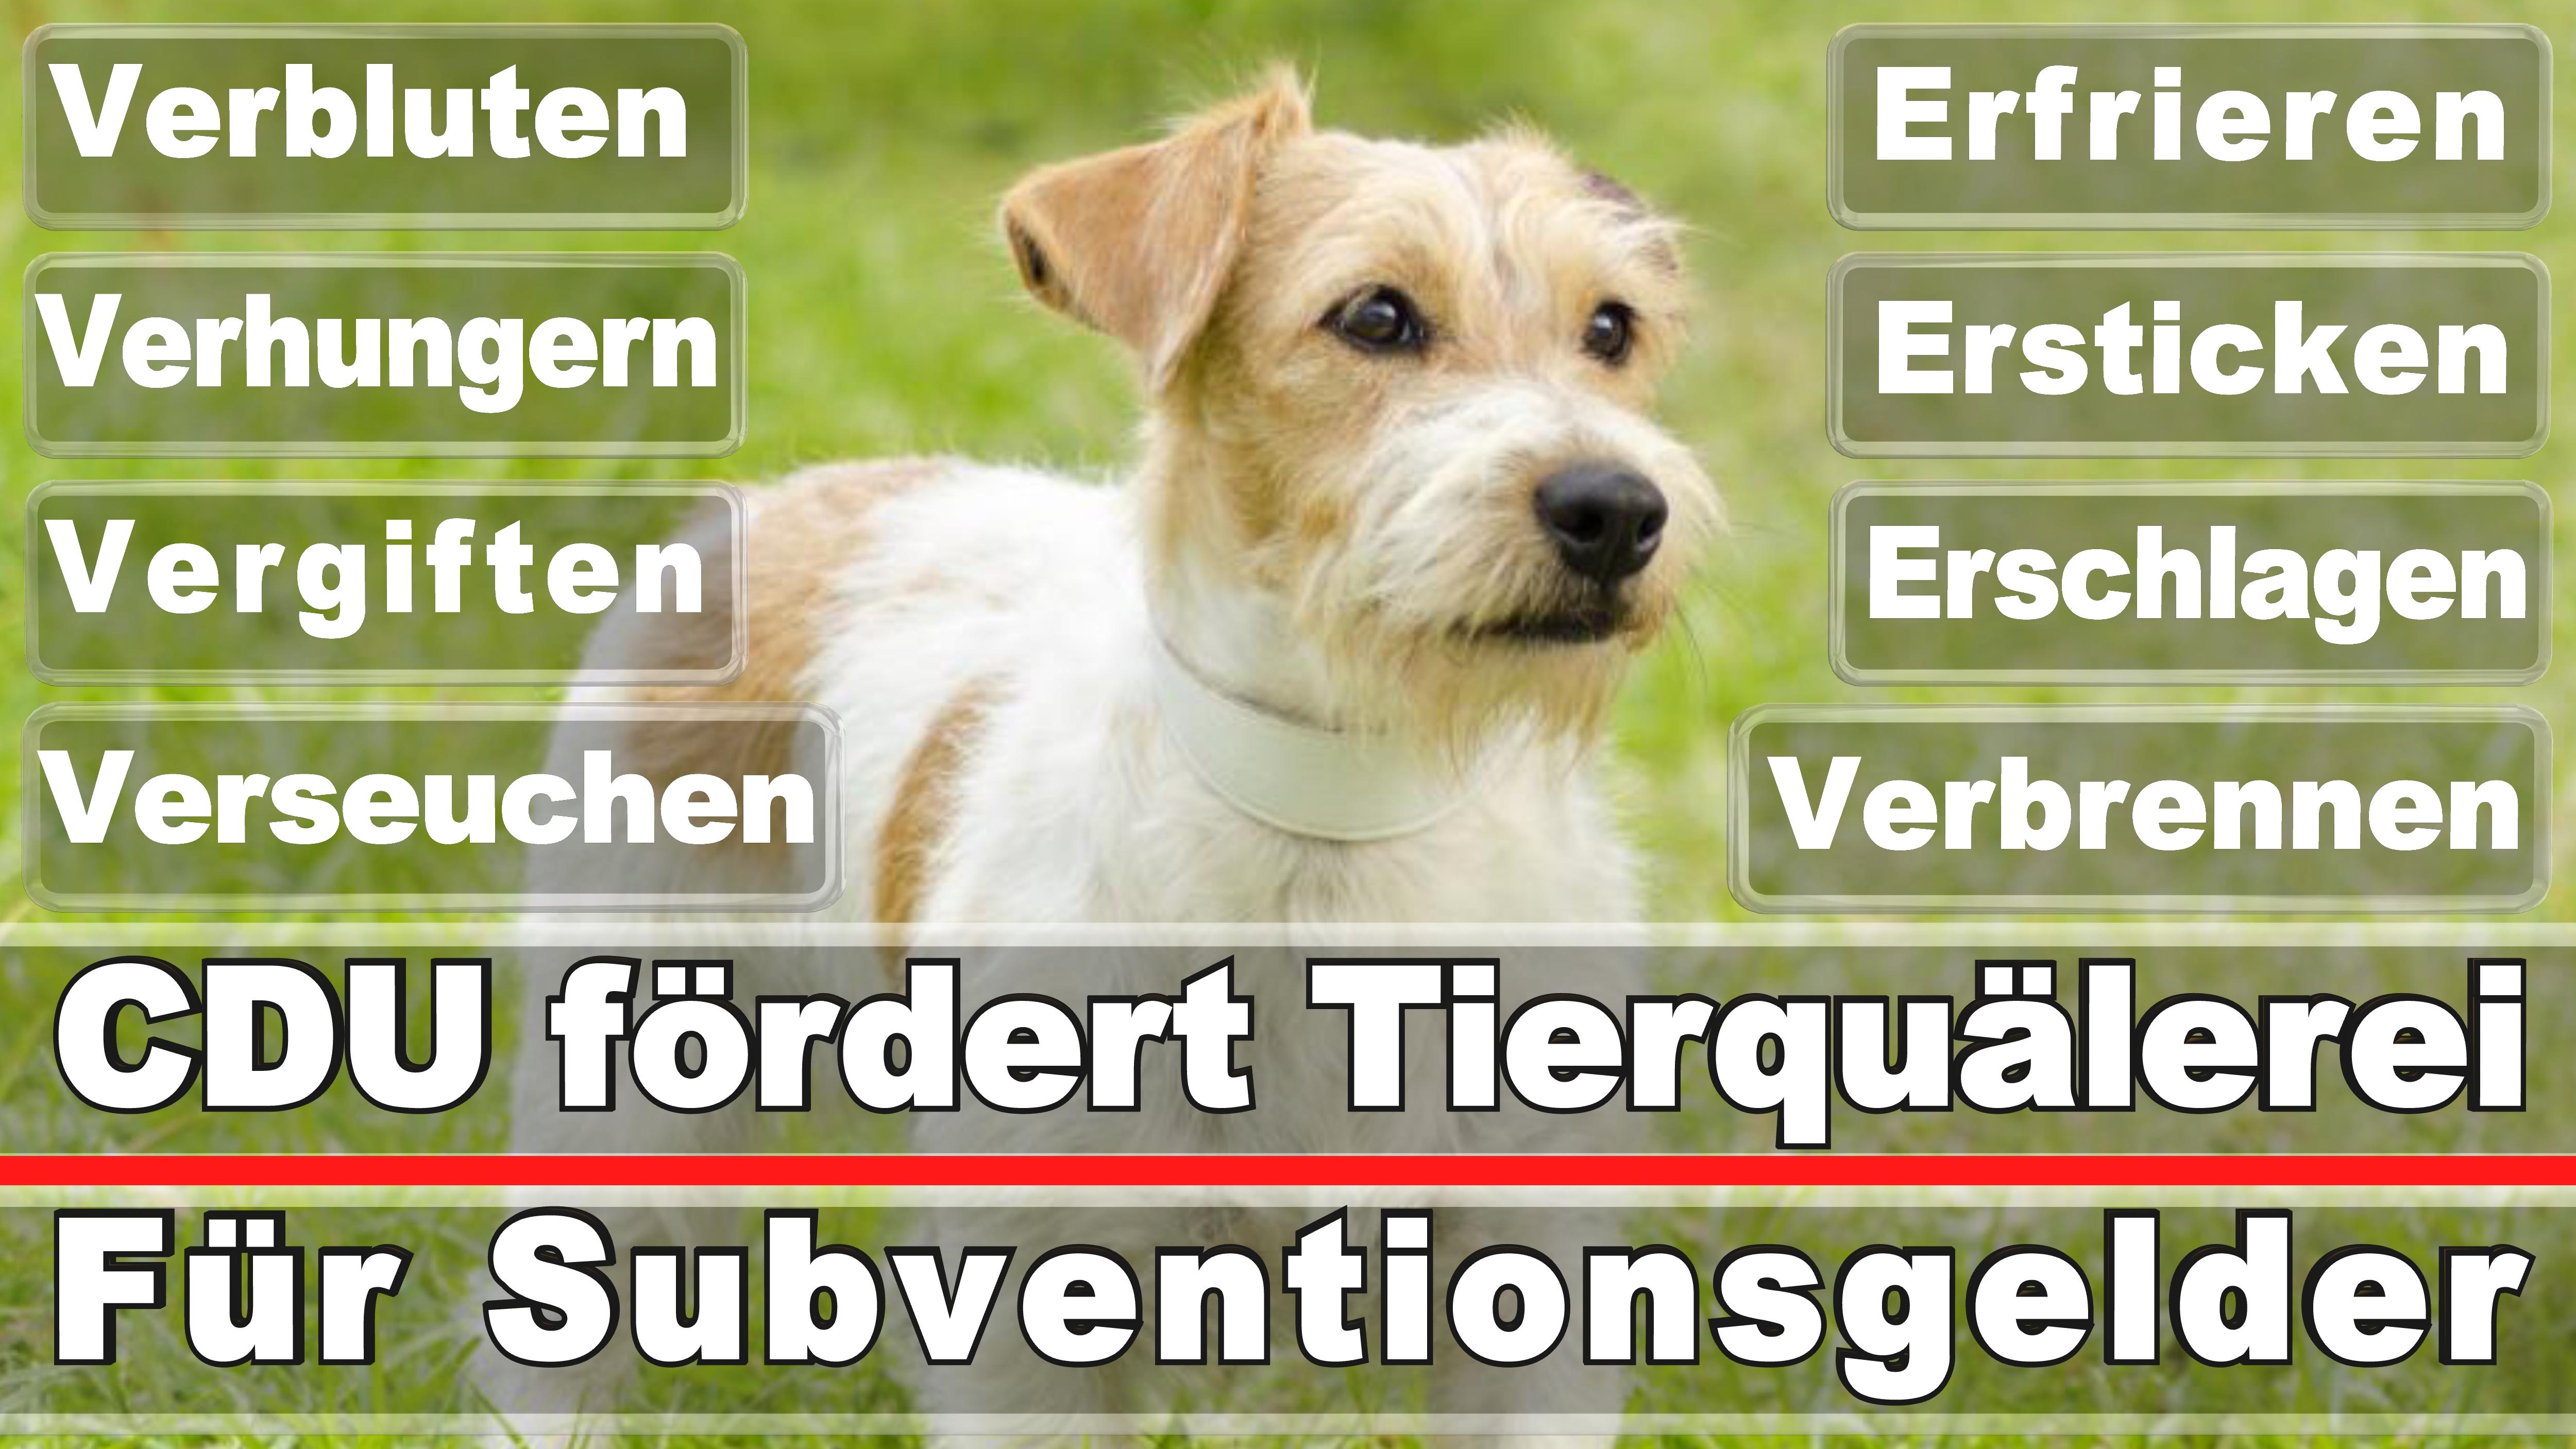 Landtagswahl-Bundestagswahl-CDU-SPD-FDP-AFD-Linke-Piraten-Tierschutzpartei (51)